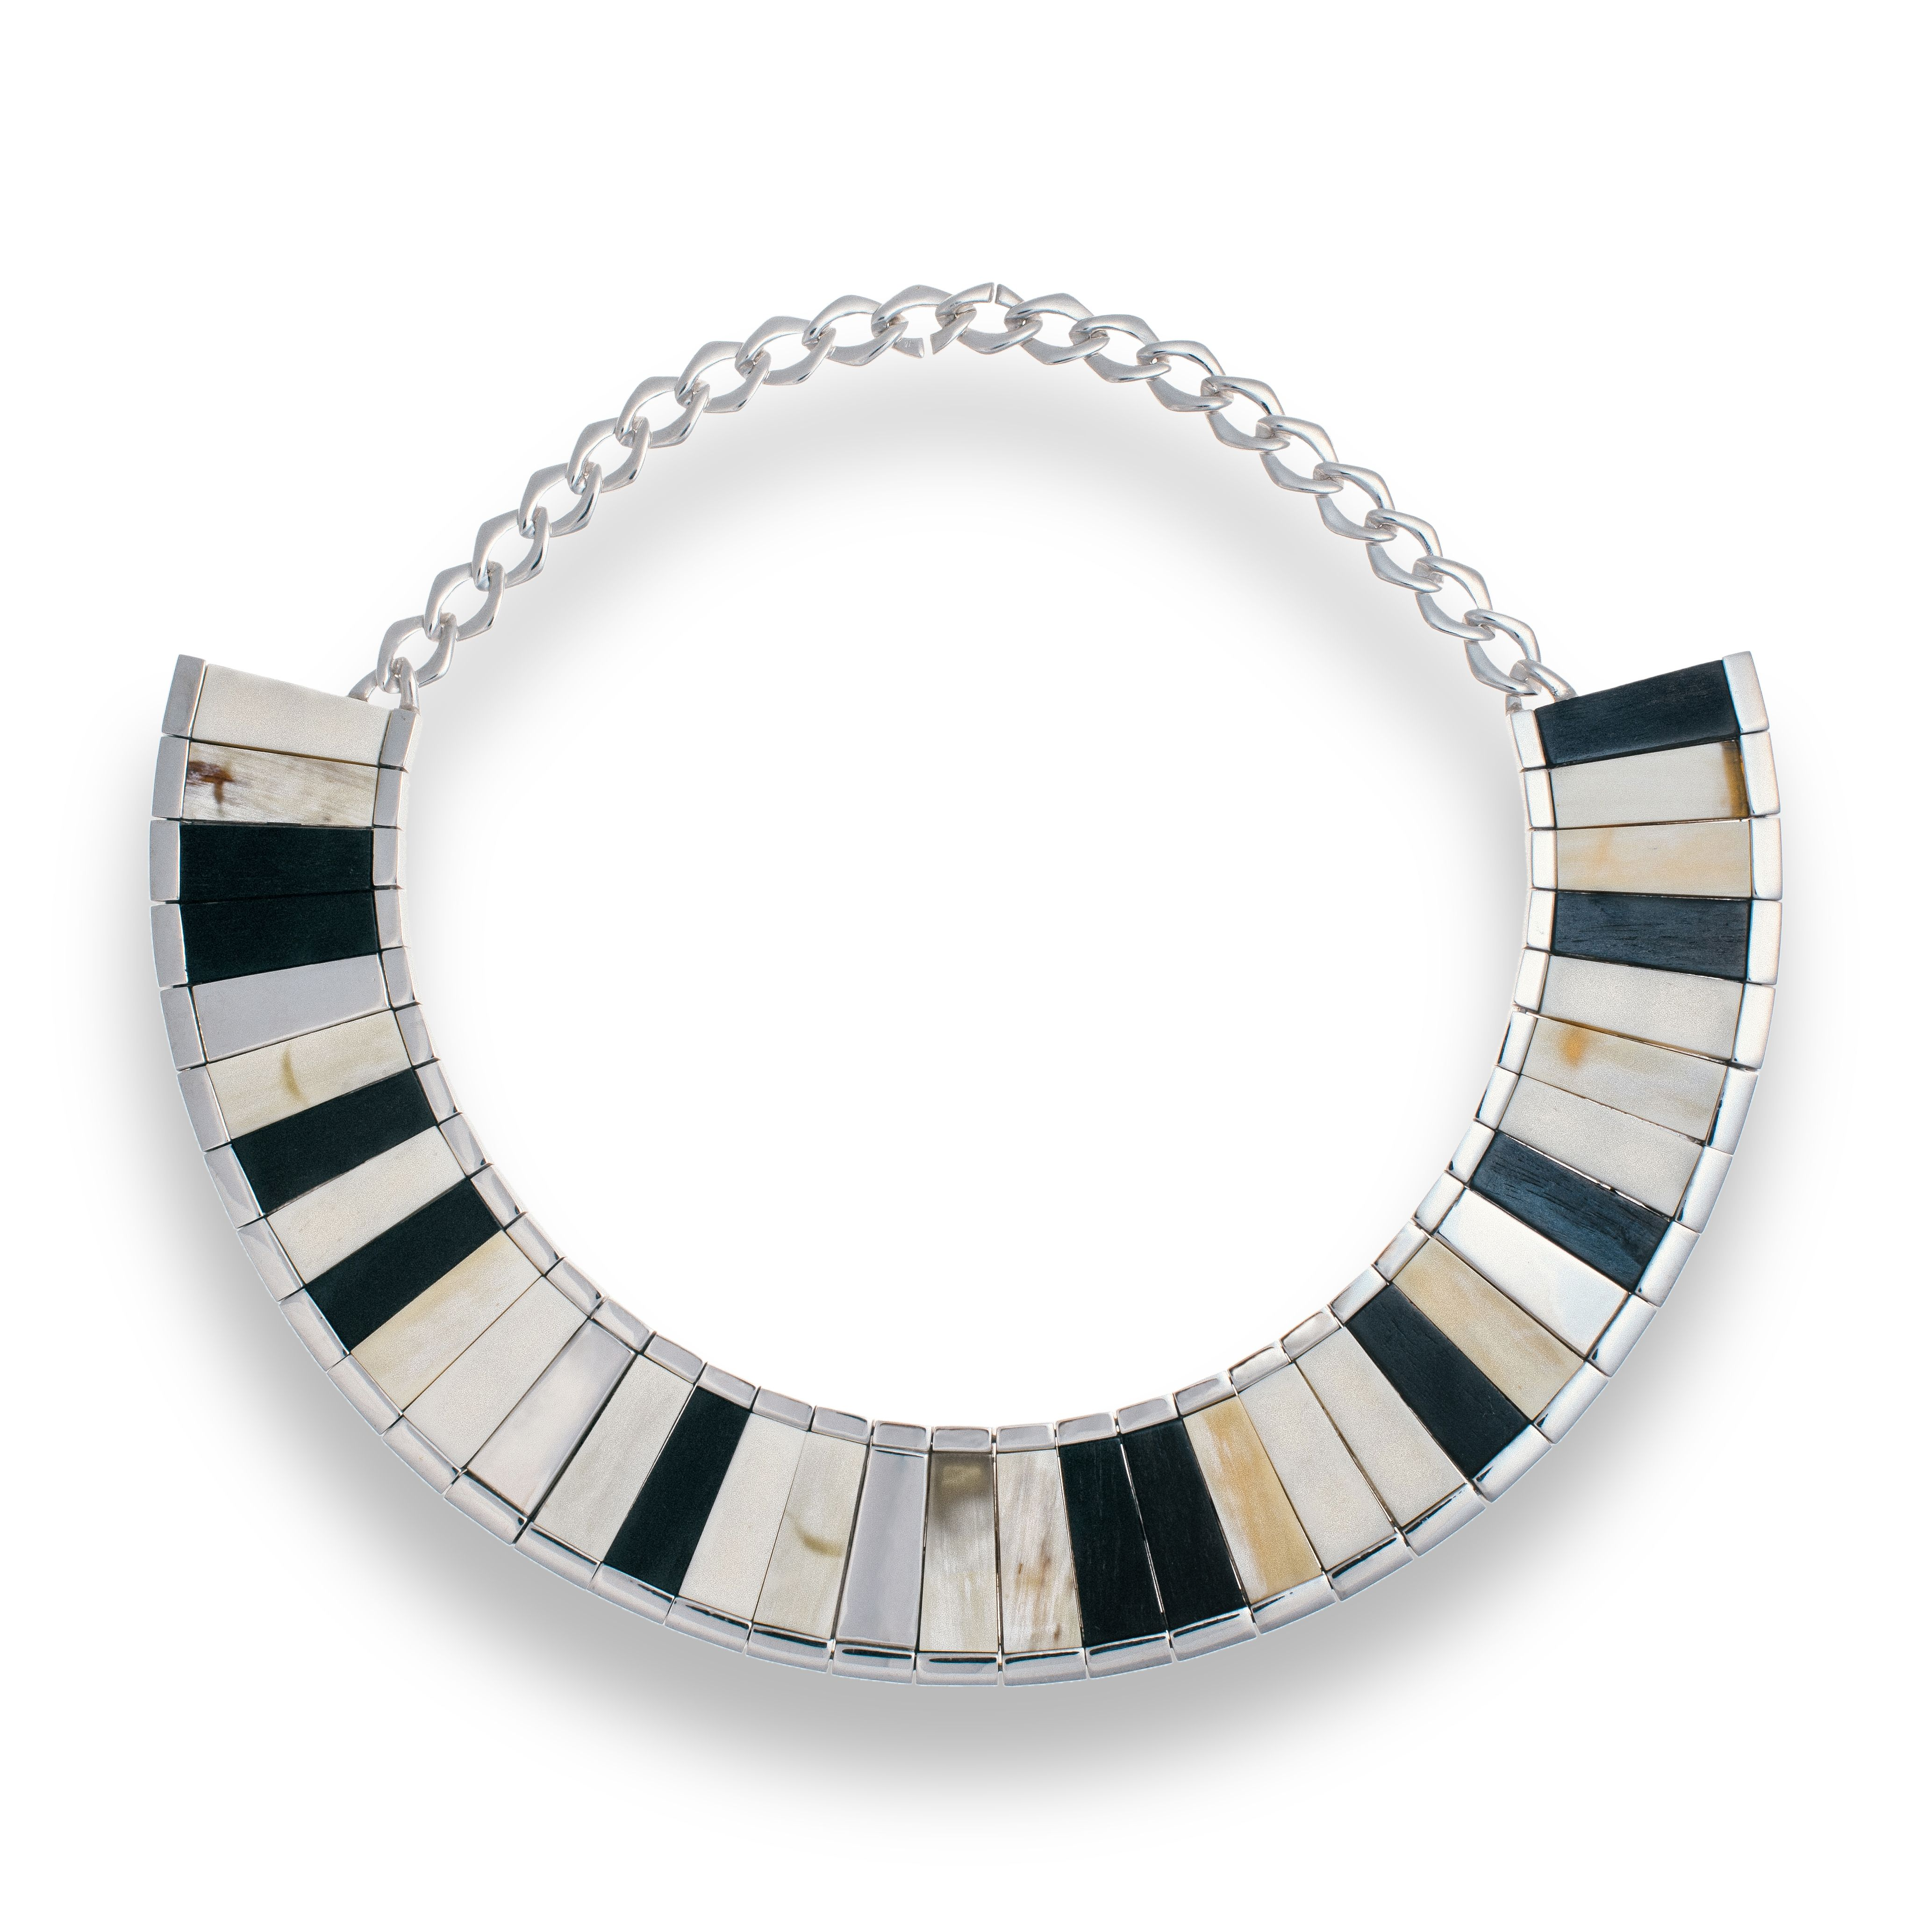 Hissia Ife Horn Gold Bracelet SiEFEgUG1W